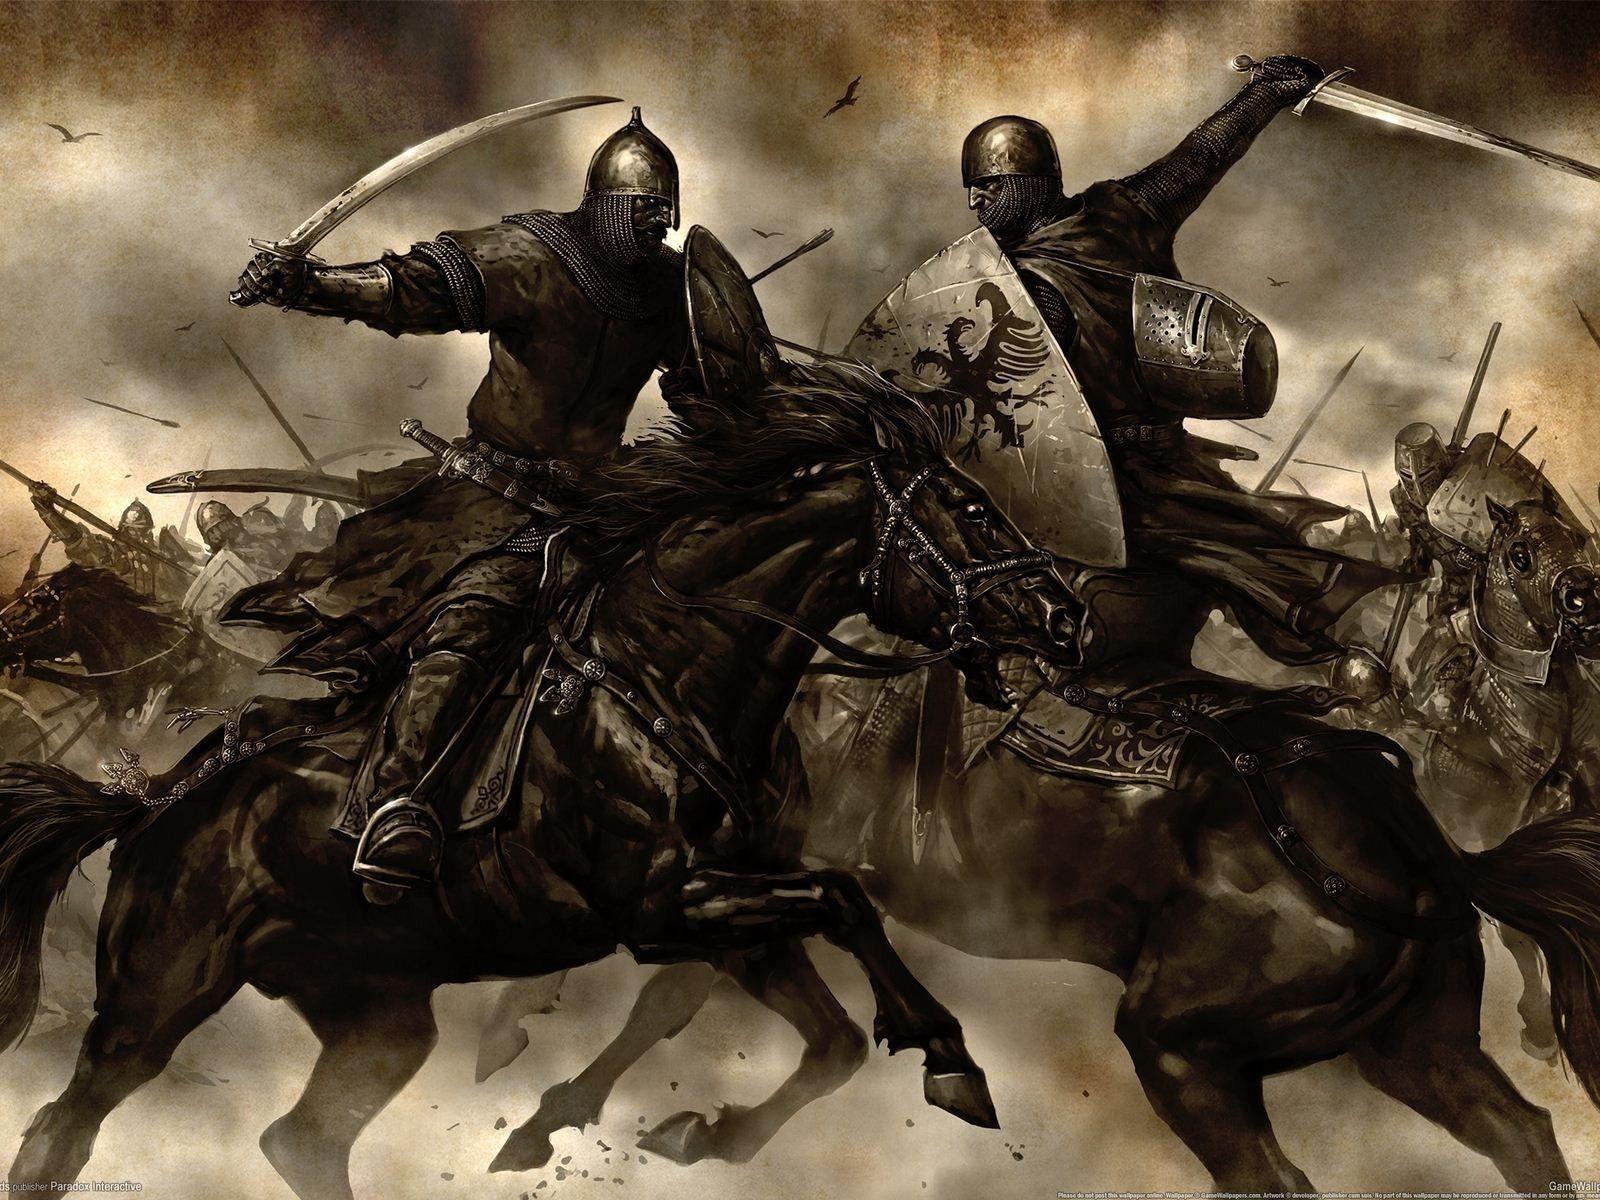 Top Wallpaper Horse Warrior - 72e3648f46535b02184856abe656c67f  Image_108171.jpg